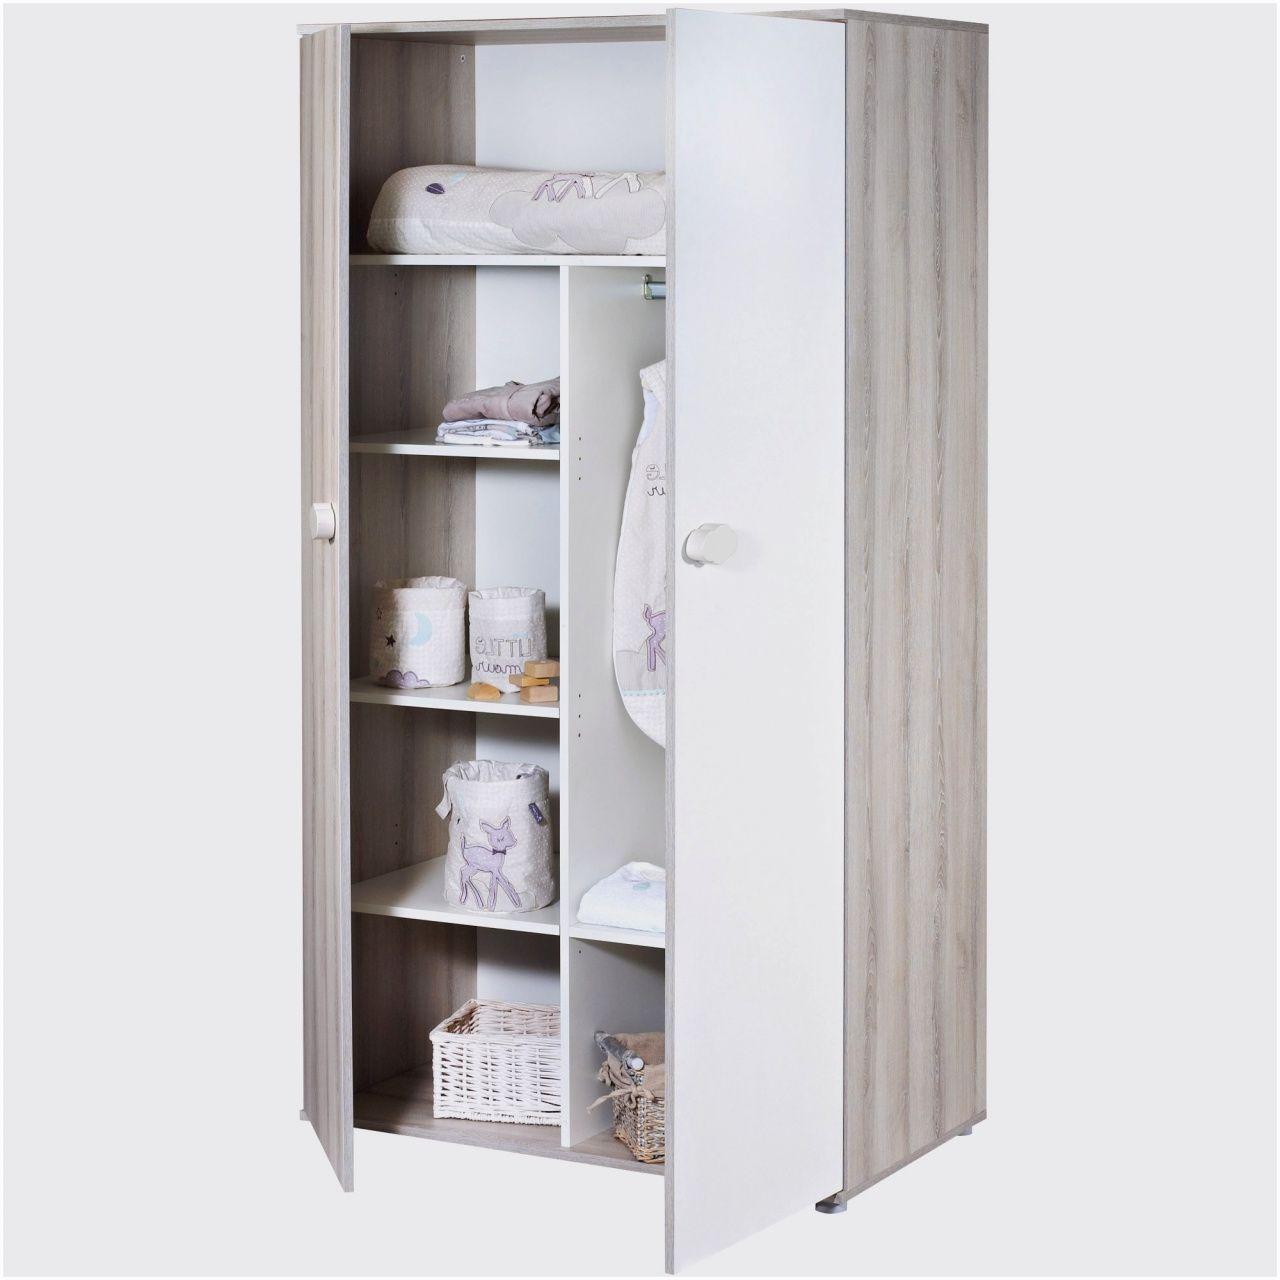 201 Meuble Haut Profondeur 20 Cm With Images Locker Storage Storage Armoire